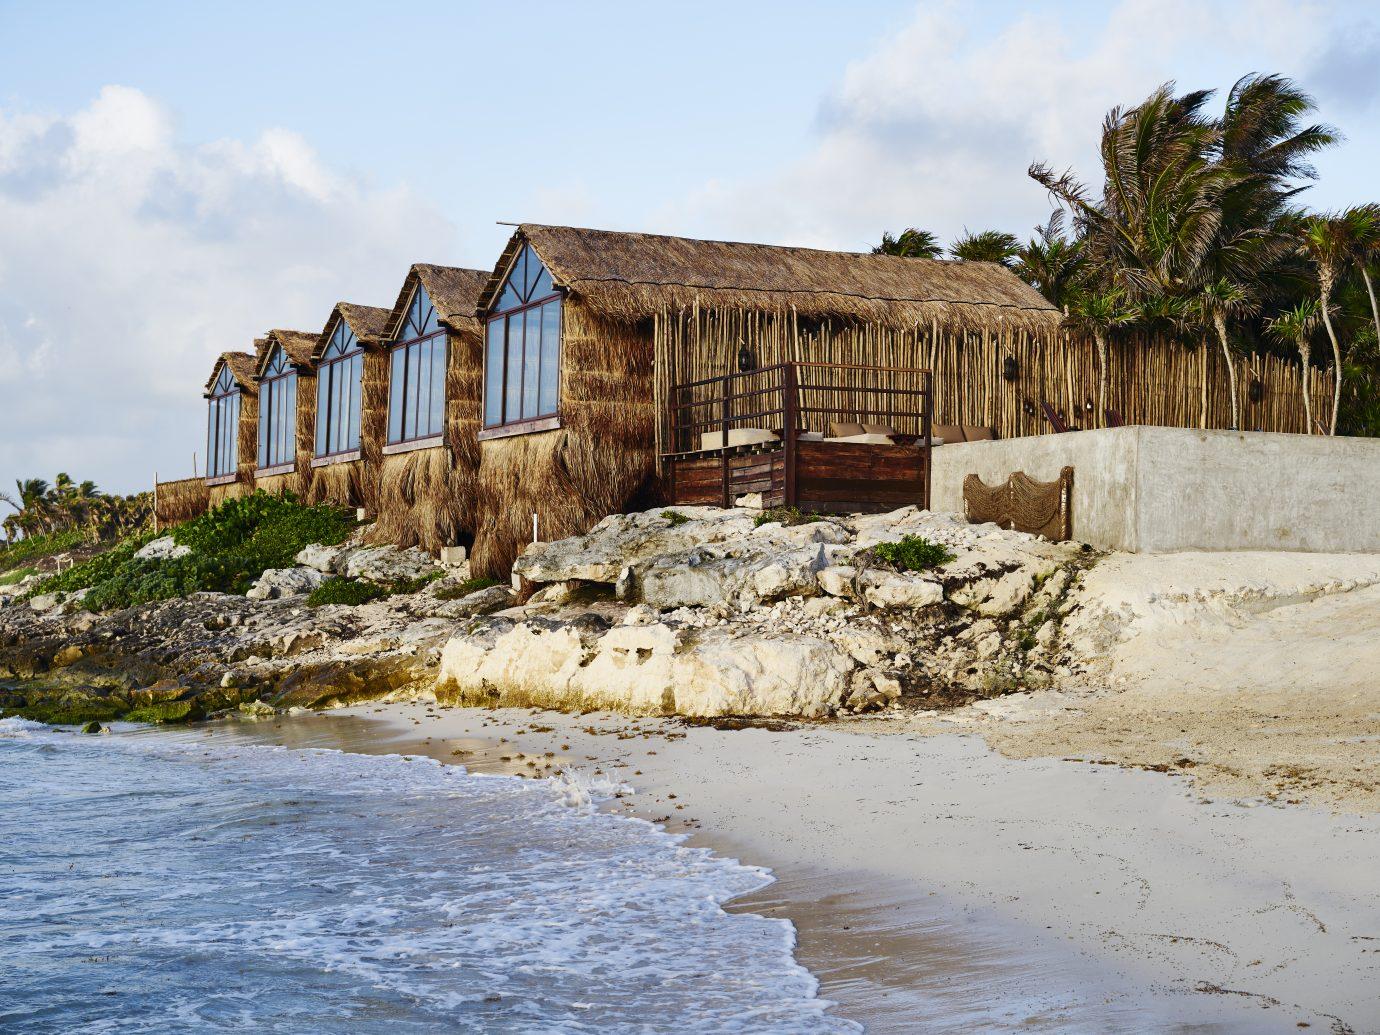 Habitas Tulum exterior next to beach